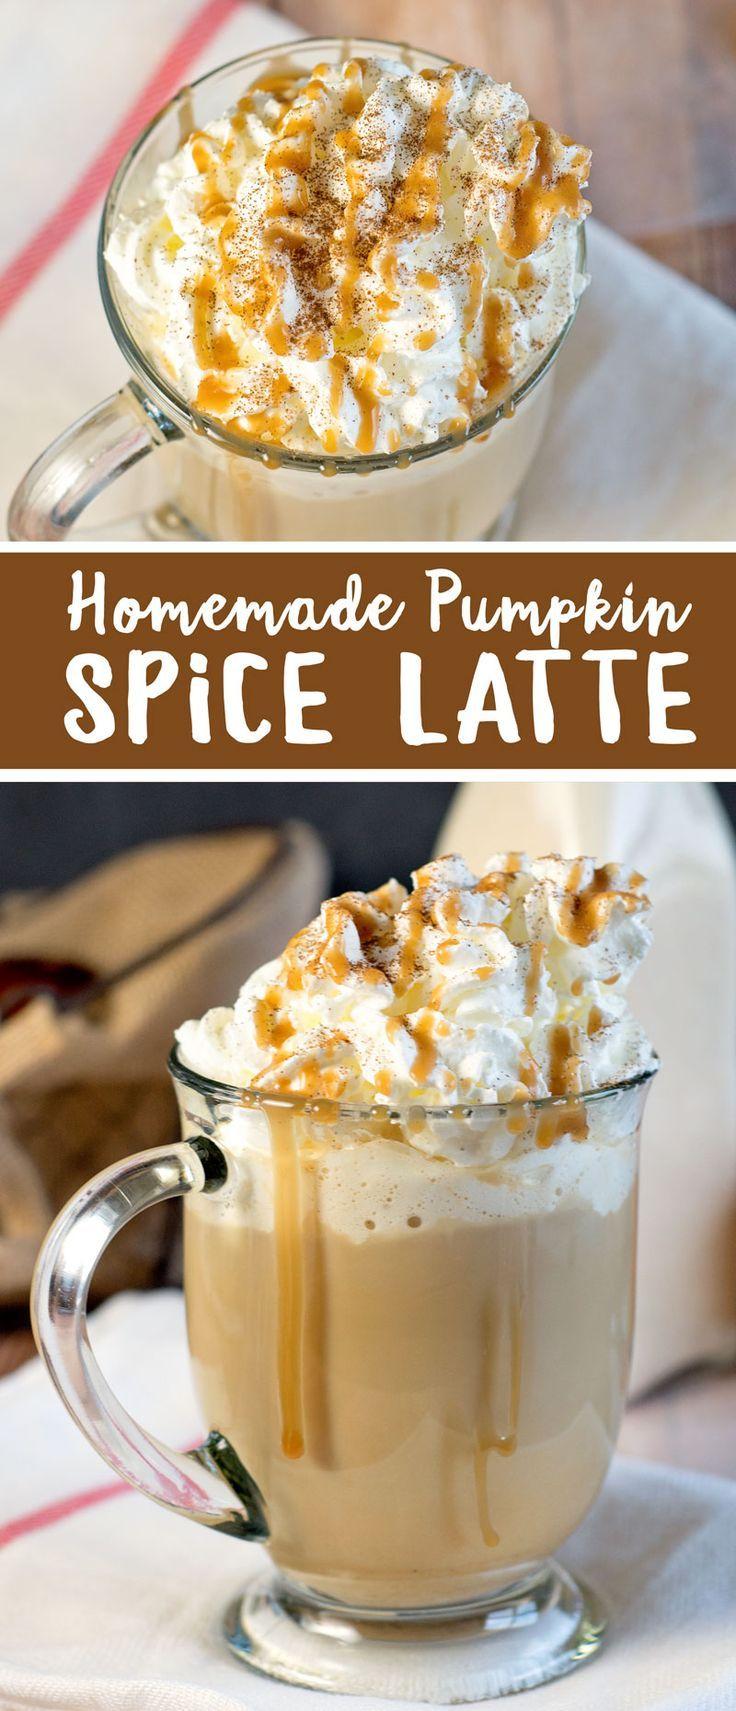 Homemade Pumpkin Spice Latte Recipe Made with milk